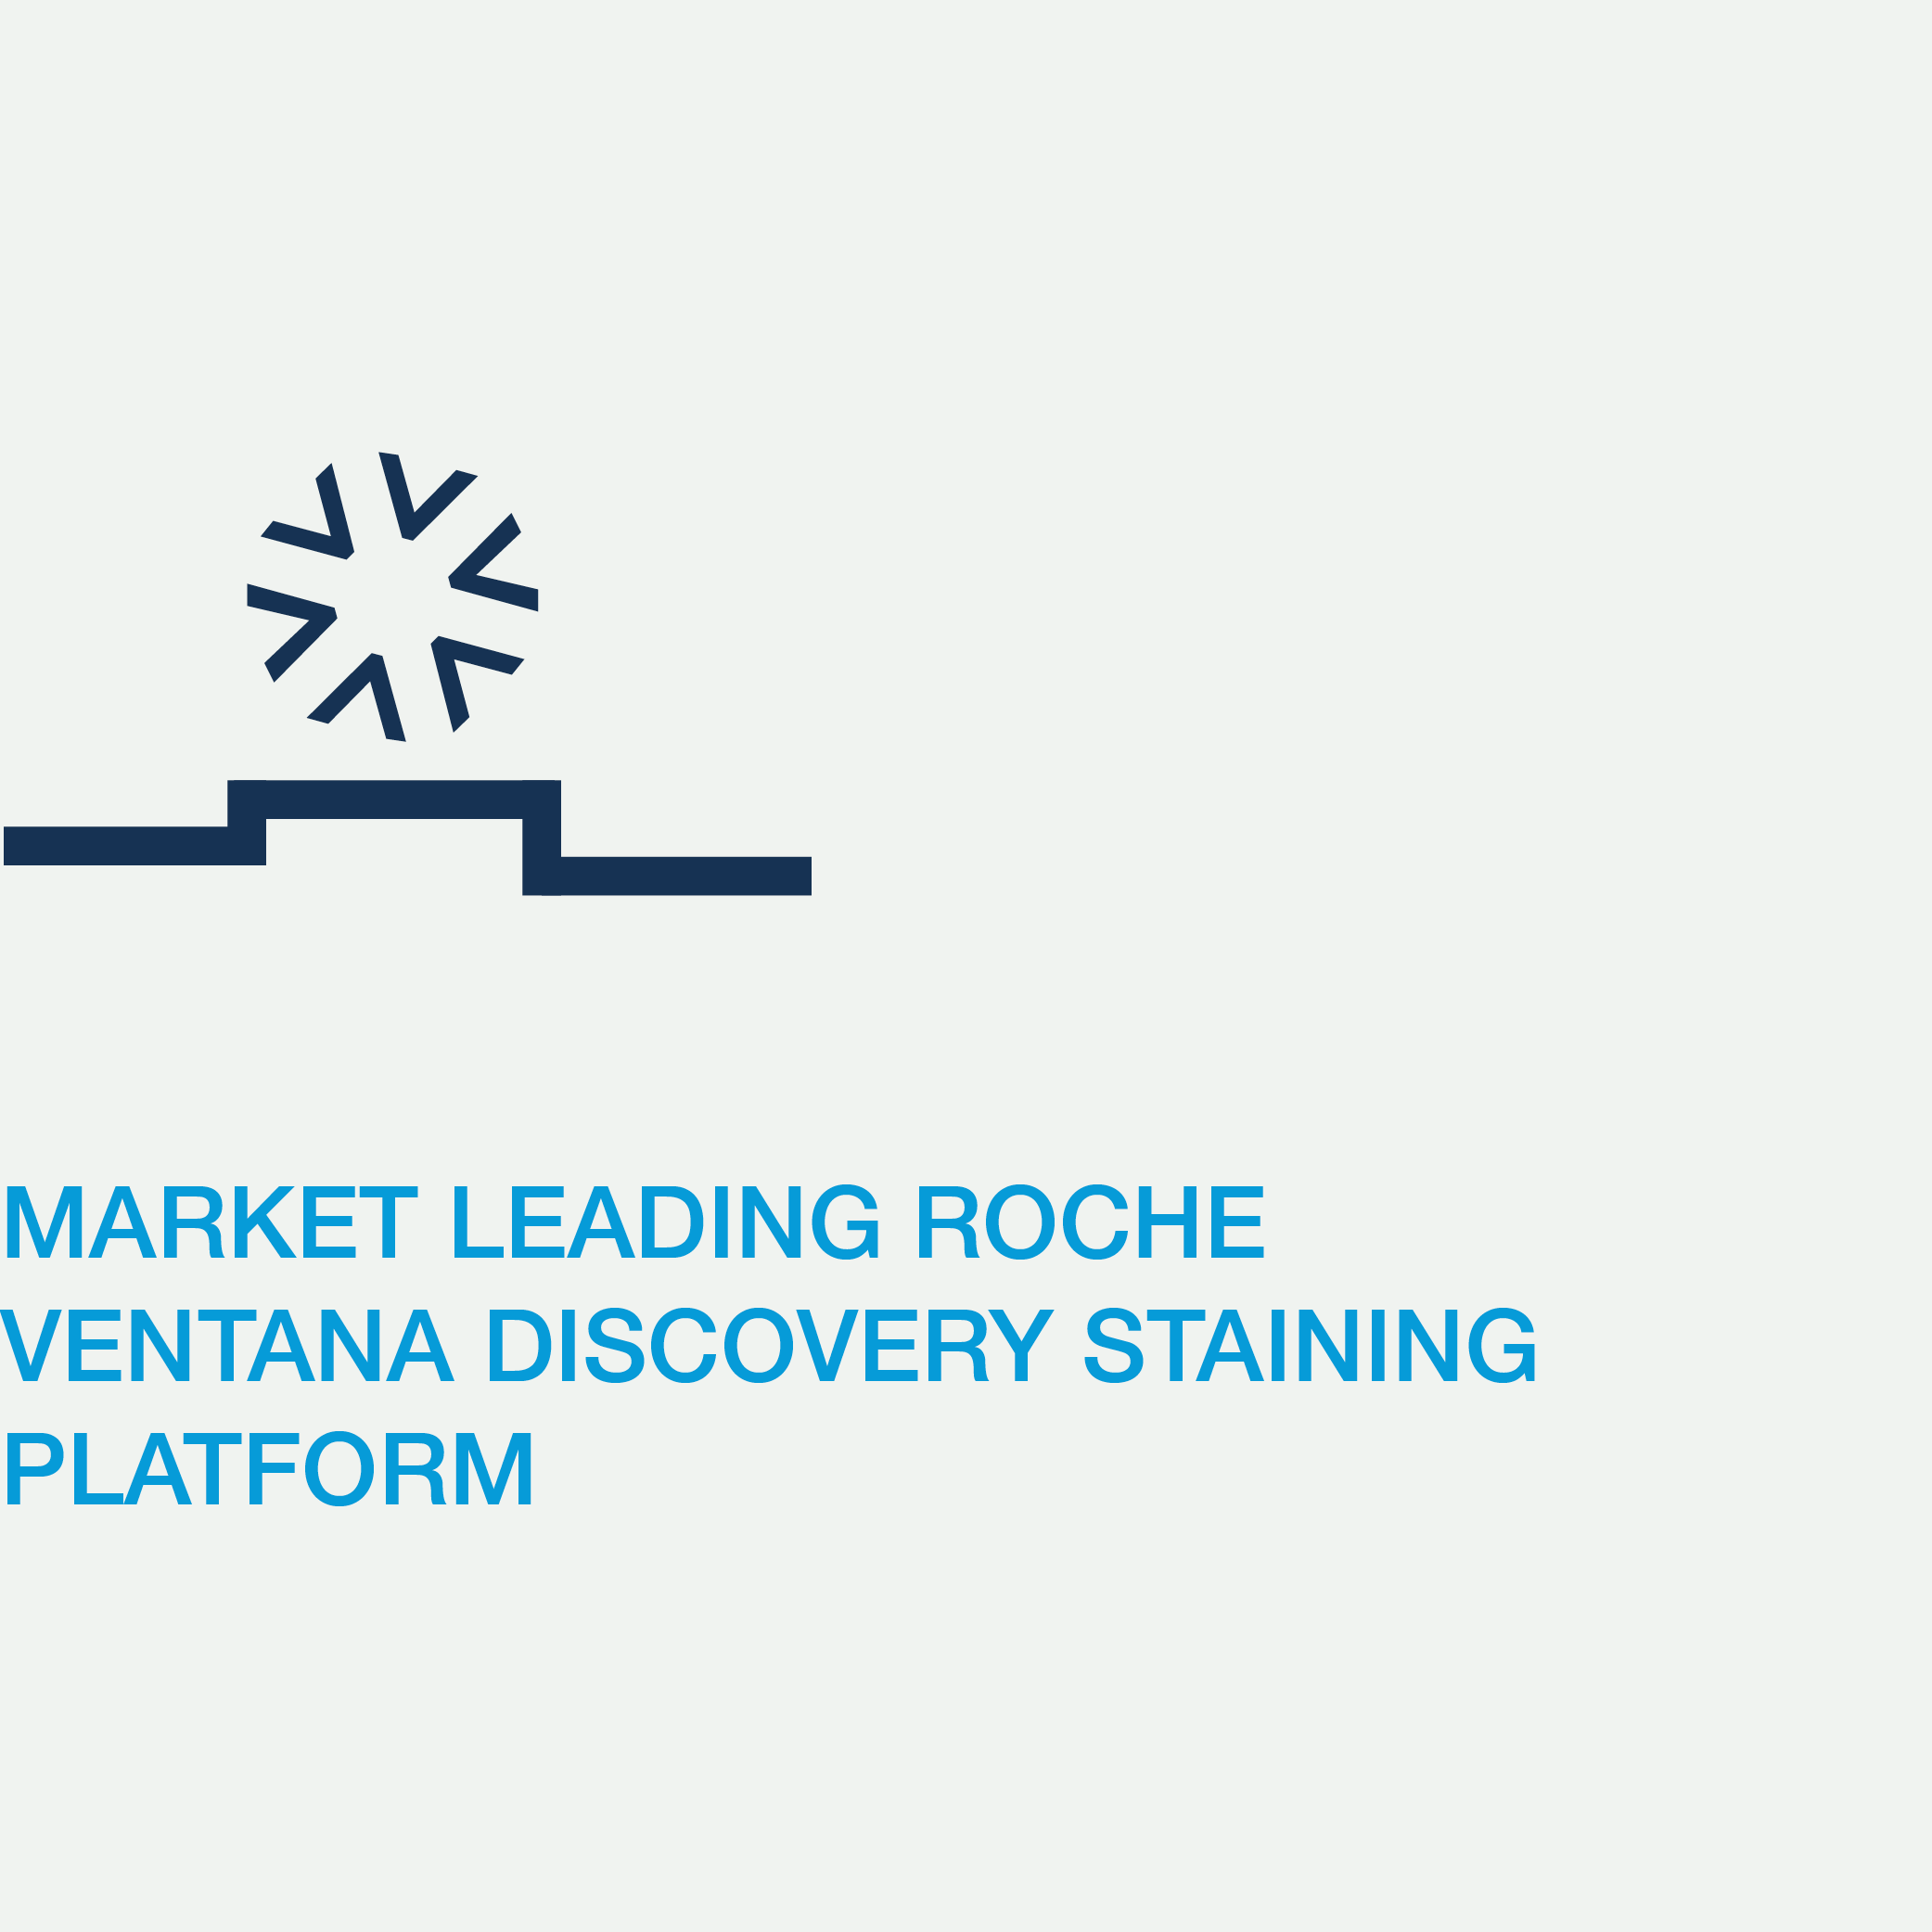 Services-market-leading-Roche-Ventana-icon.png